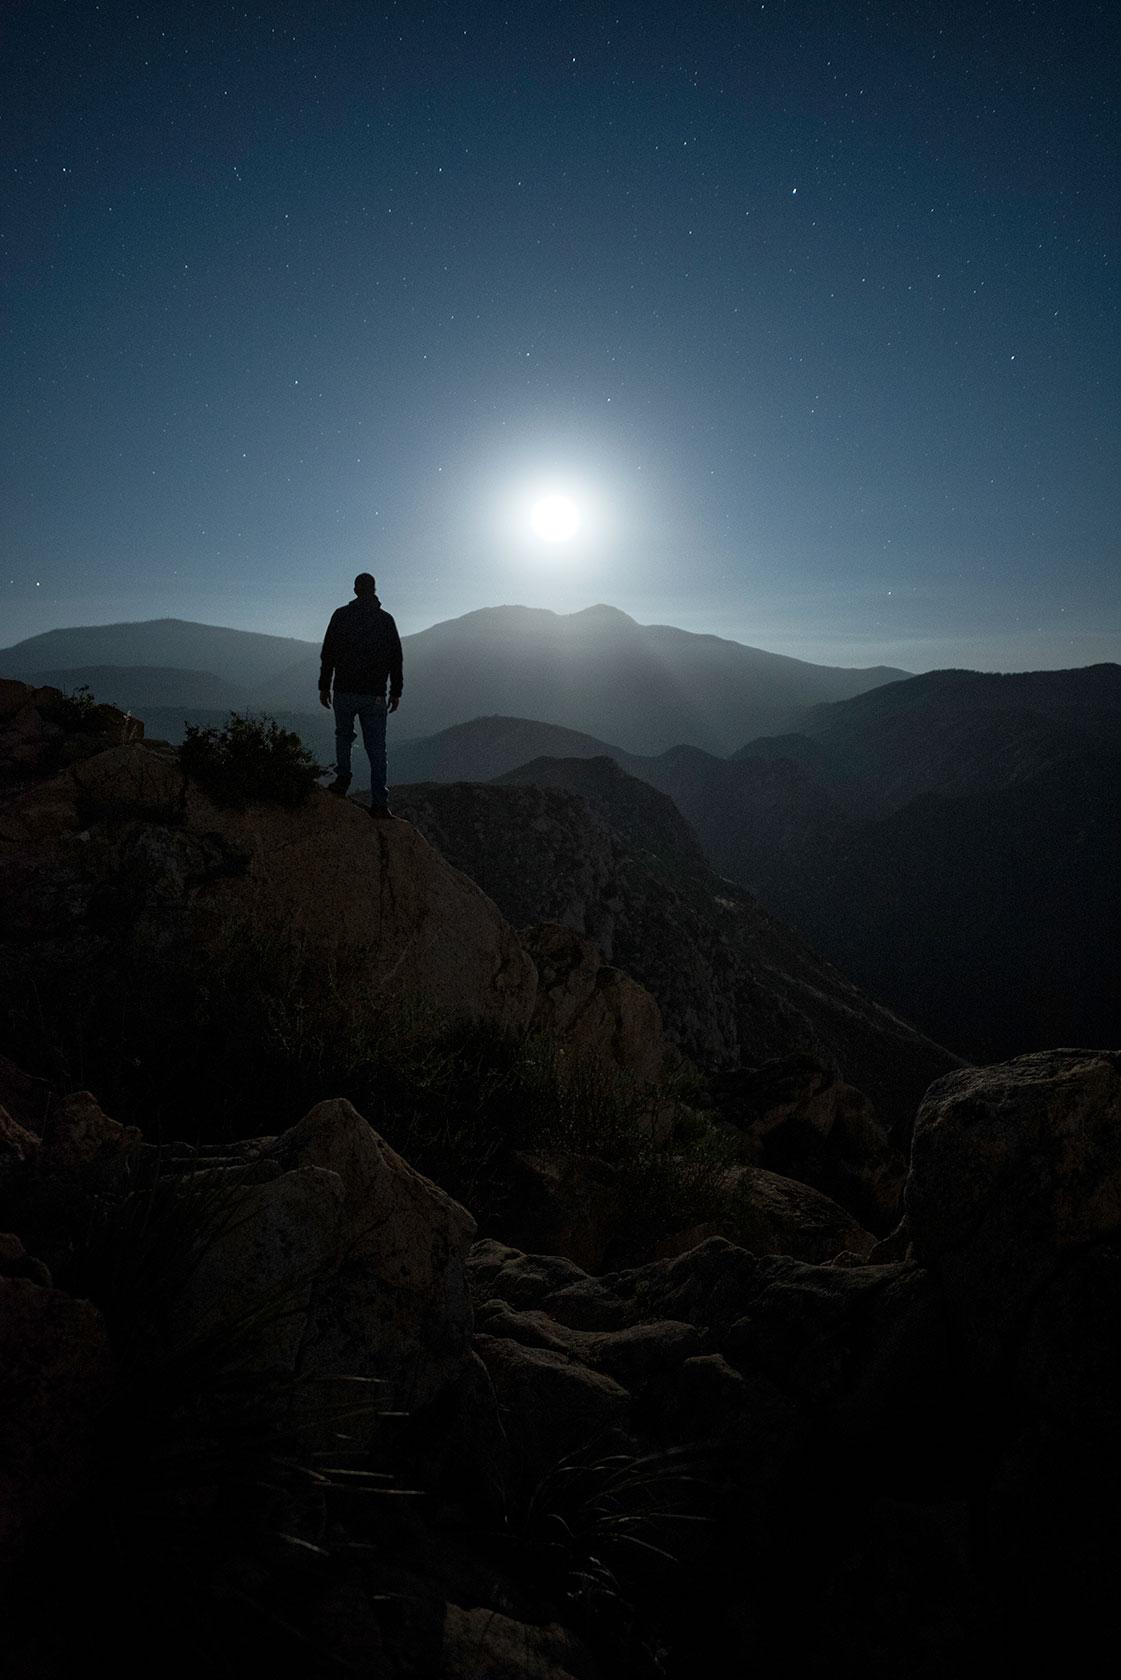 austin-trigg-southern-california-rising-moon-desert-mountains-moonrise-night-adventure.jpg